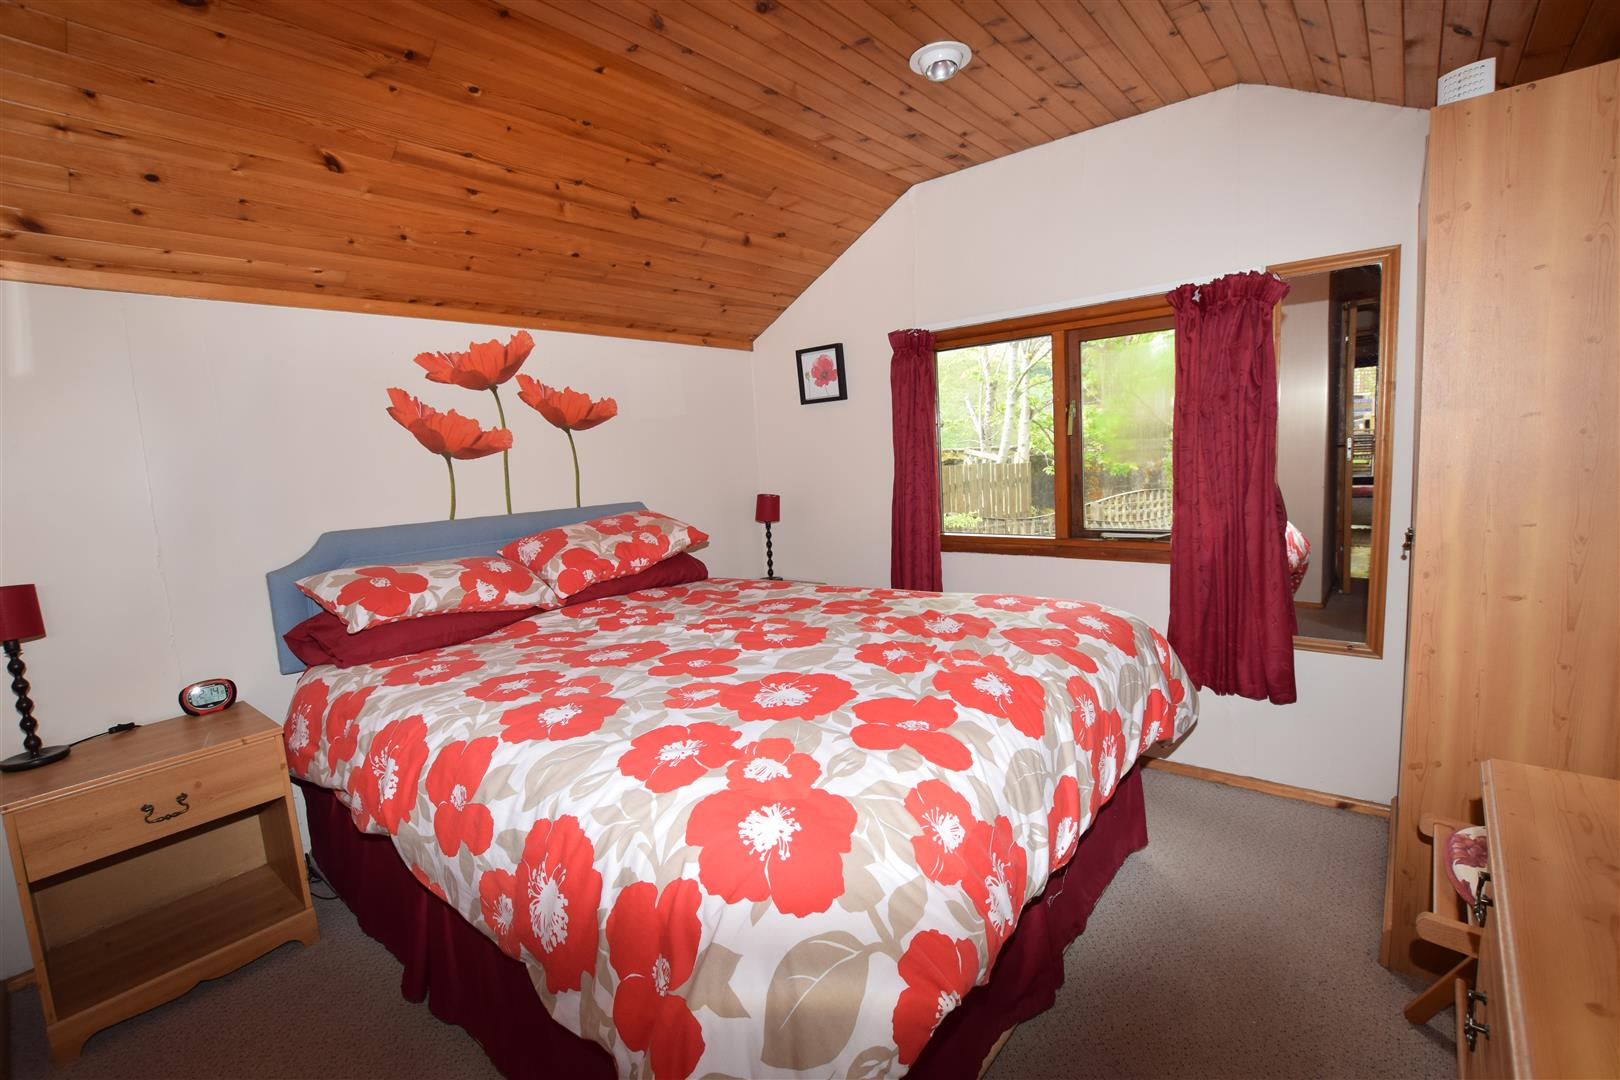 Poppy Lodge, Invertilt Road, Rivertilt Holiday Park, Blair Atholl, Perthshire, PH18 5TE, UK